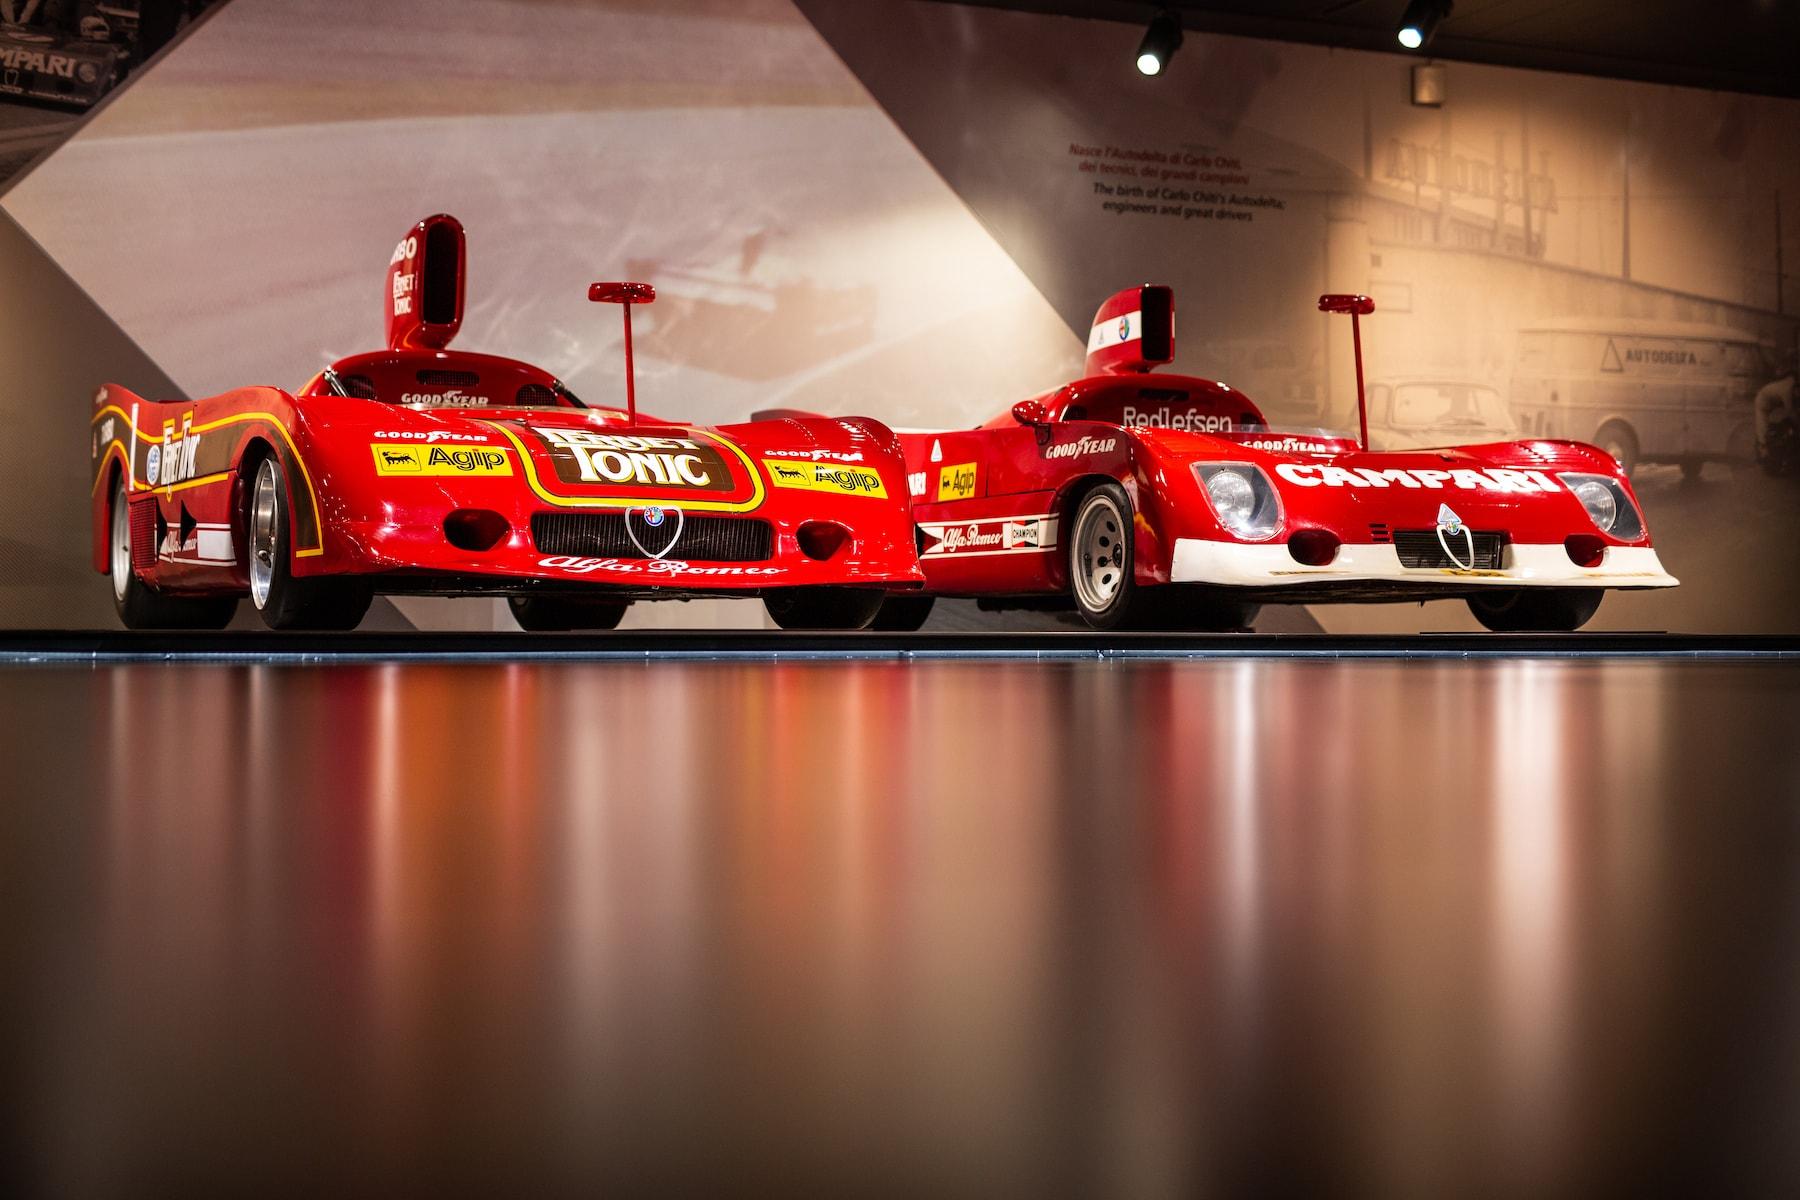 2019 Alfa Romeo at Museo Storico | 2019 Italian GP 16.jpg